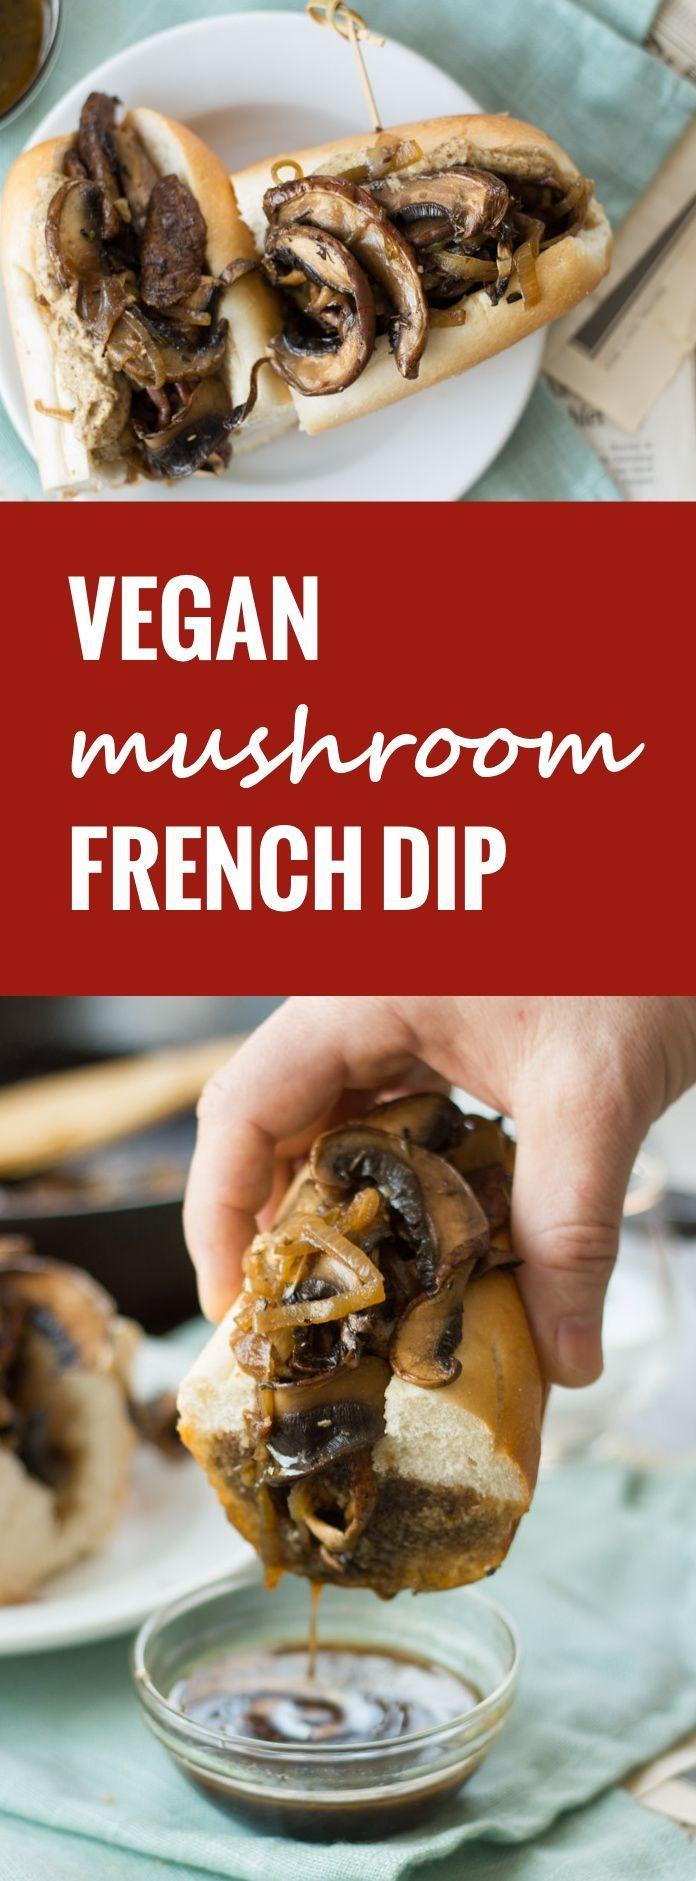 Vegan French Dip Sandwiches